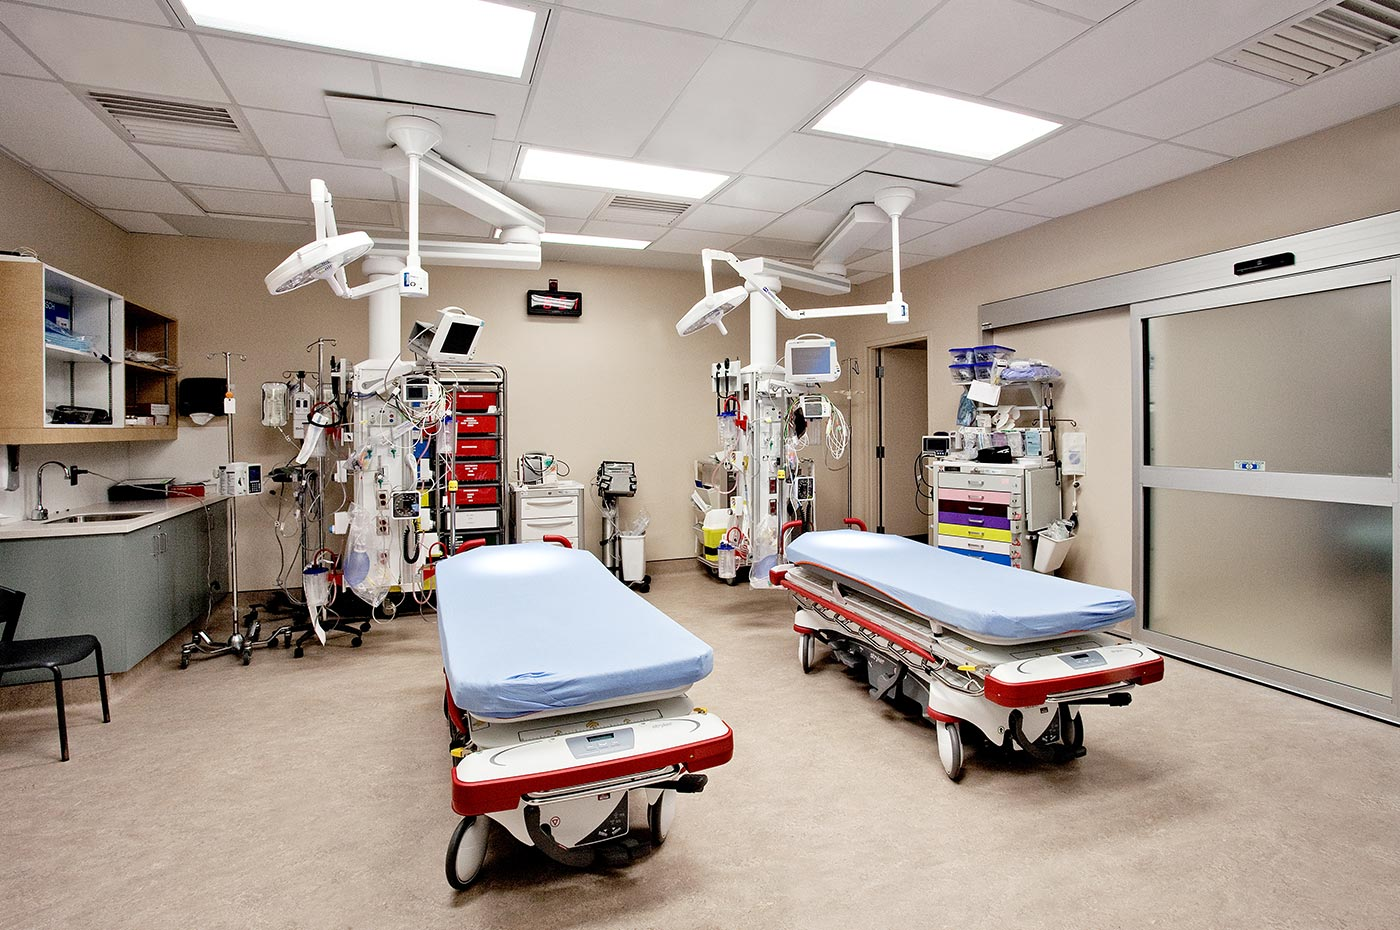 Georgian Bay General Hospital medical room